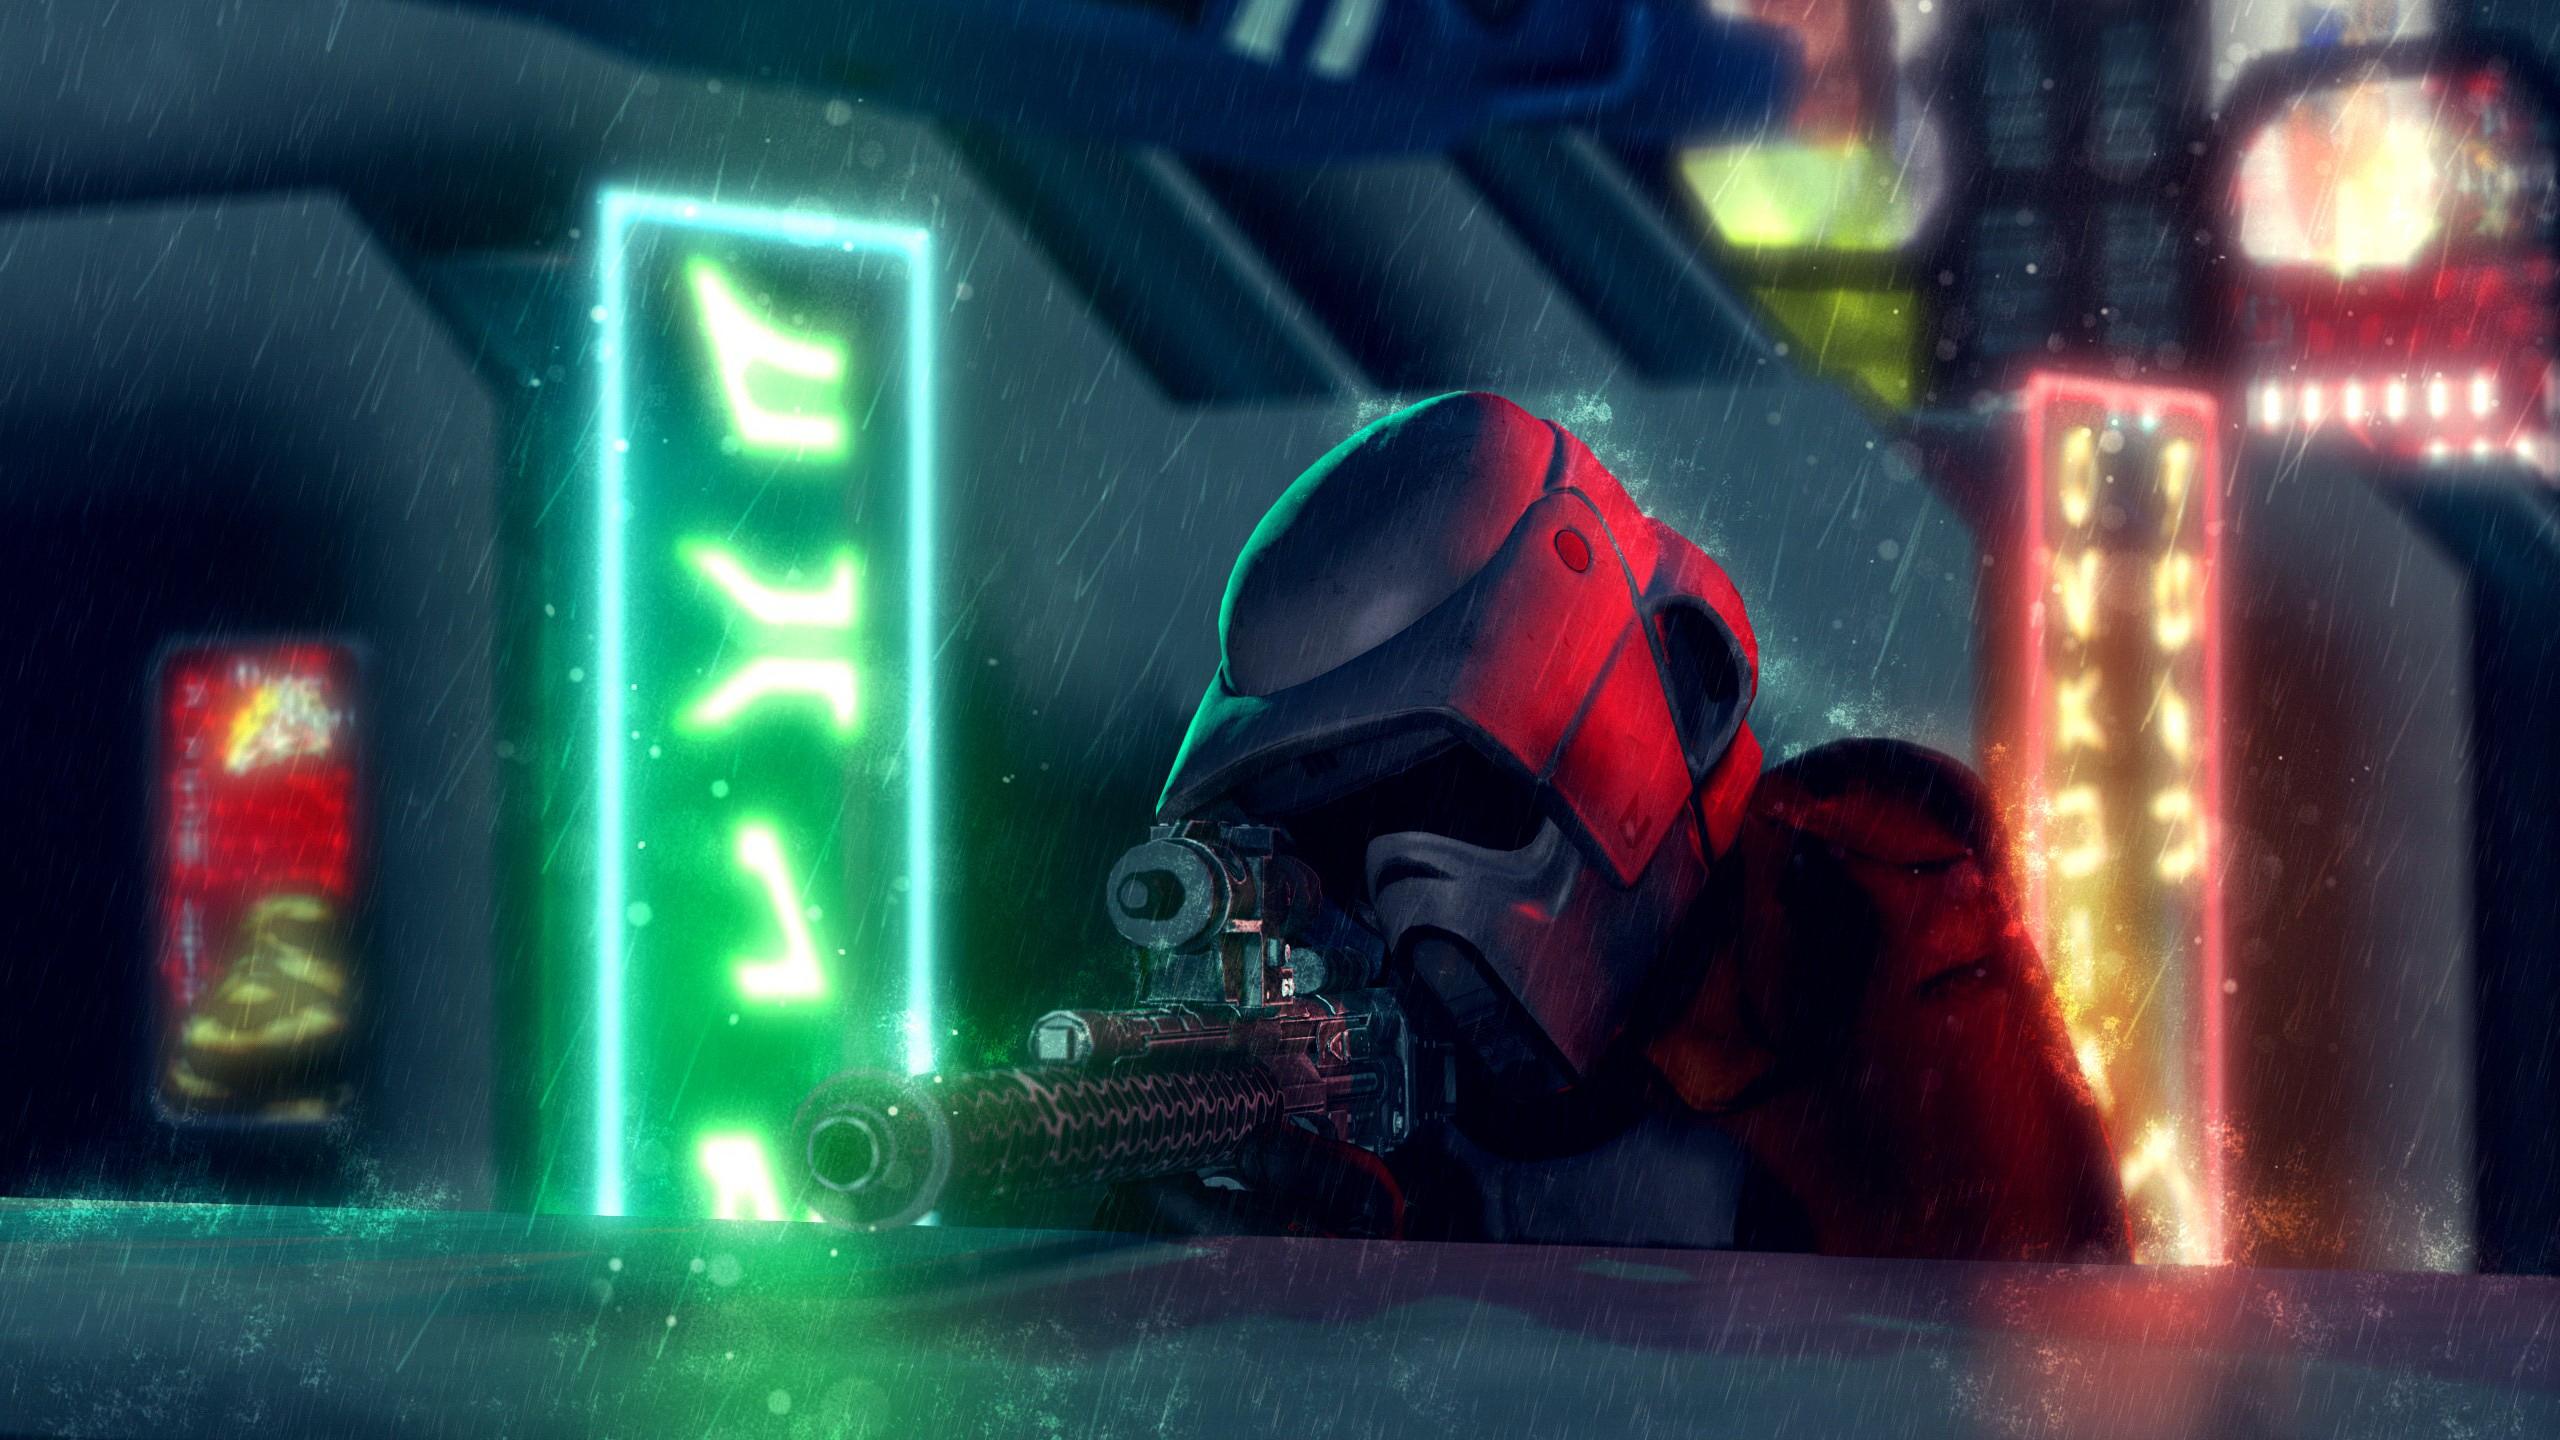 Coruscant Sniper - Star Wars Stormtrooper In Rain , HD Wallpaper & Backgrounds